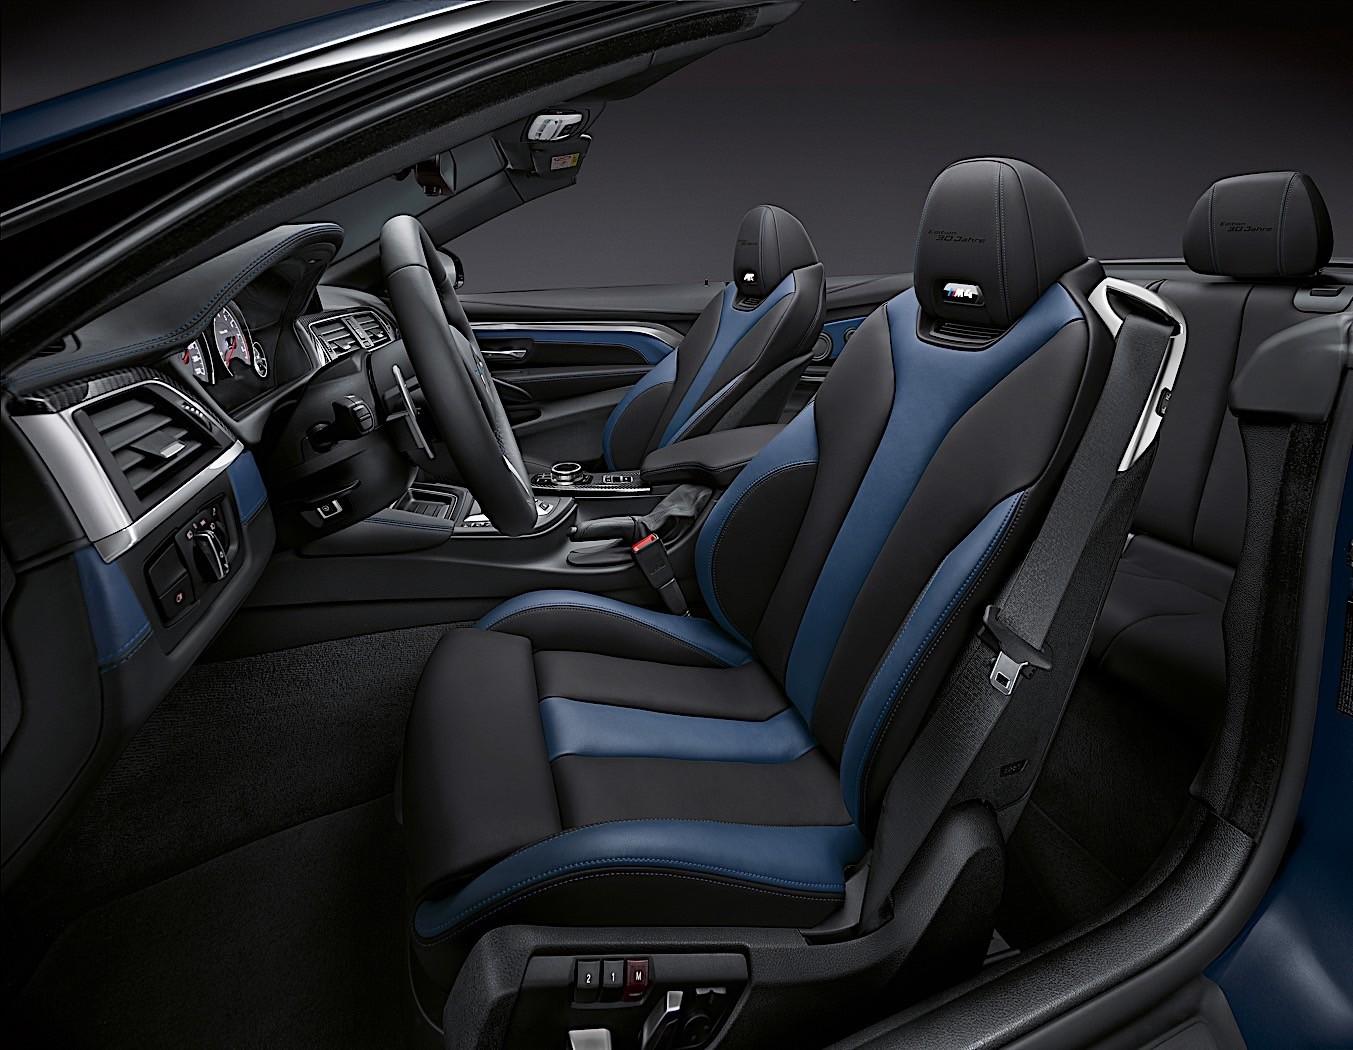 bmw m4 safety car dtm car and m235i racing come together for 14 epic seconds autoevolution. Black Bedroom Furniture Sets. Home Design Ideas